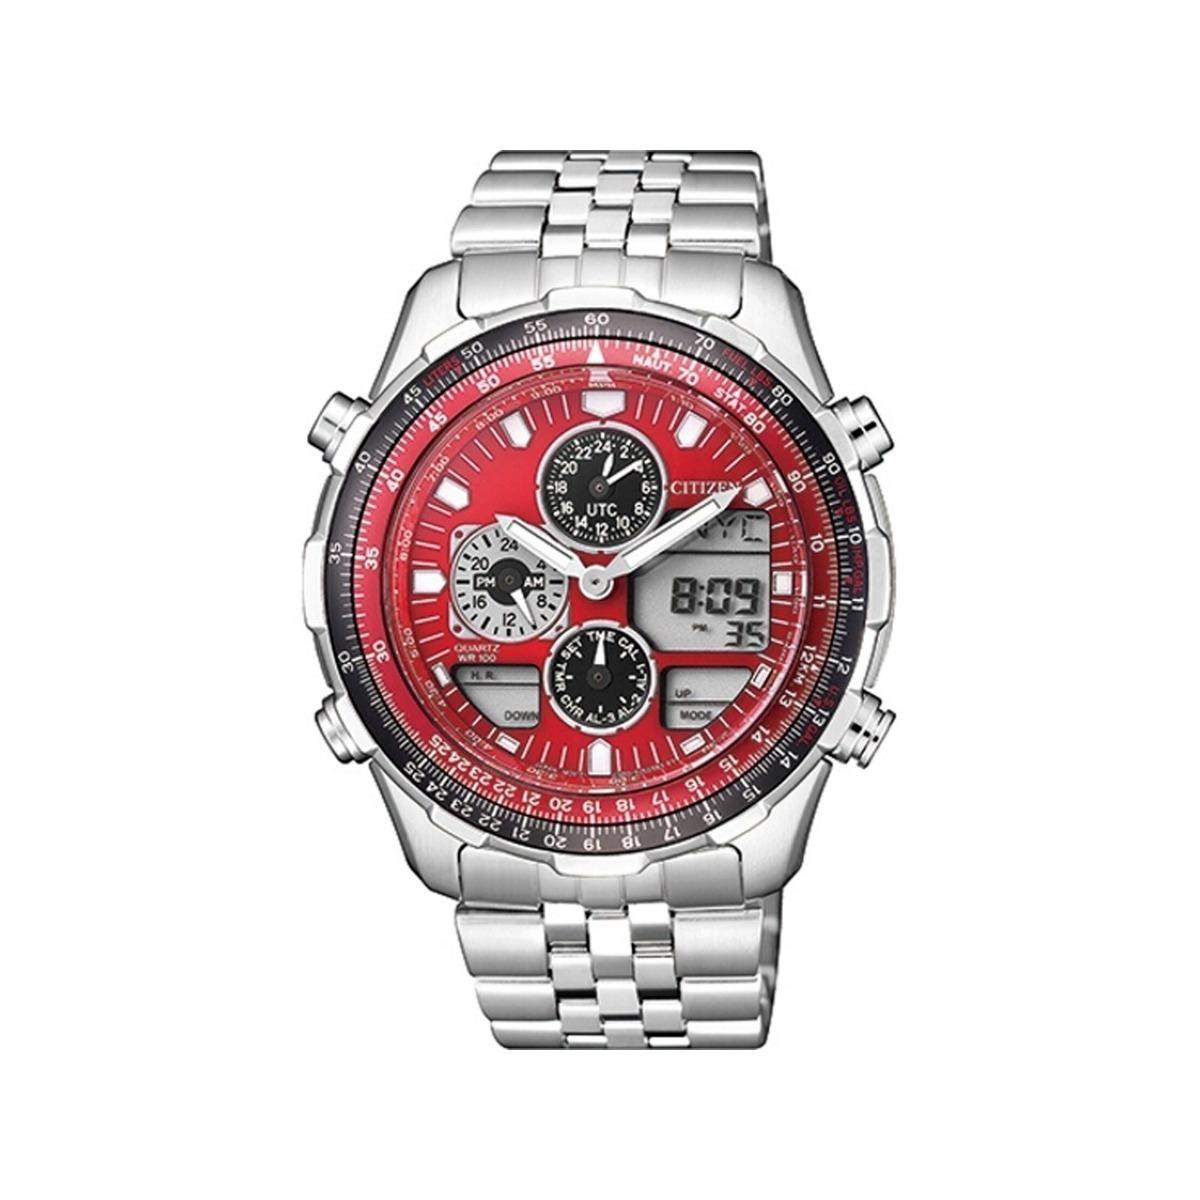 90a9844c2dc Relógio Citizen Navihawk Promaster Ar Jn0120-85x - R  1.649